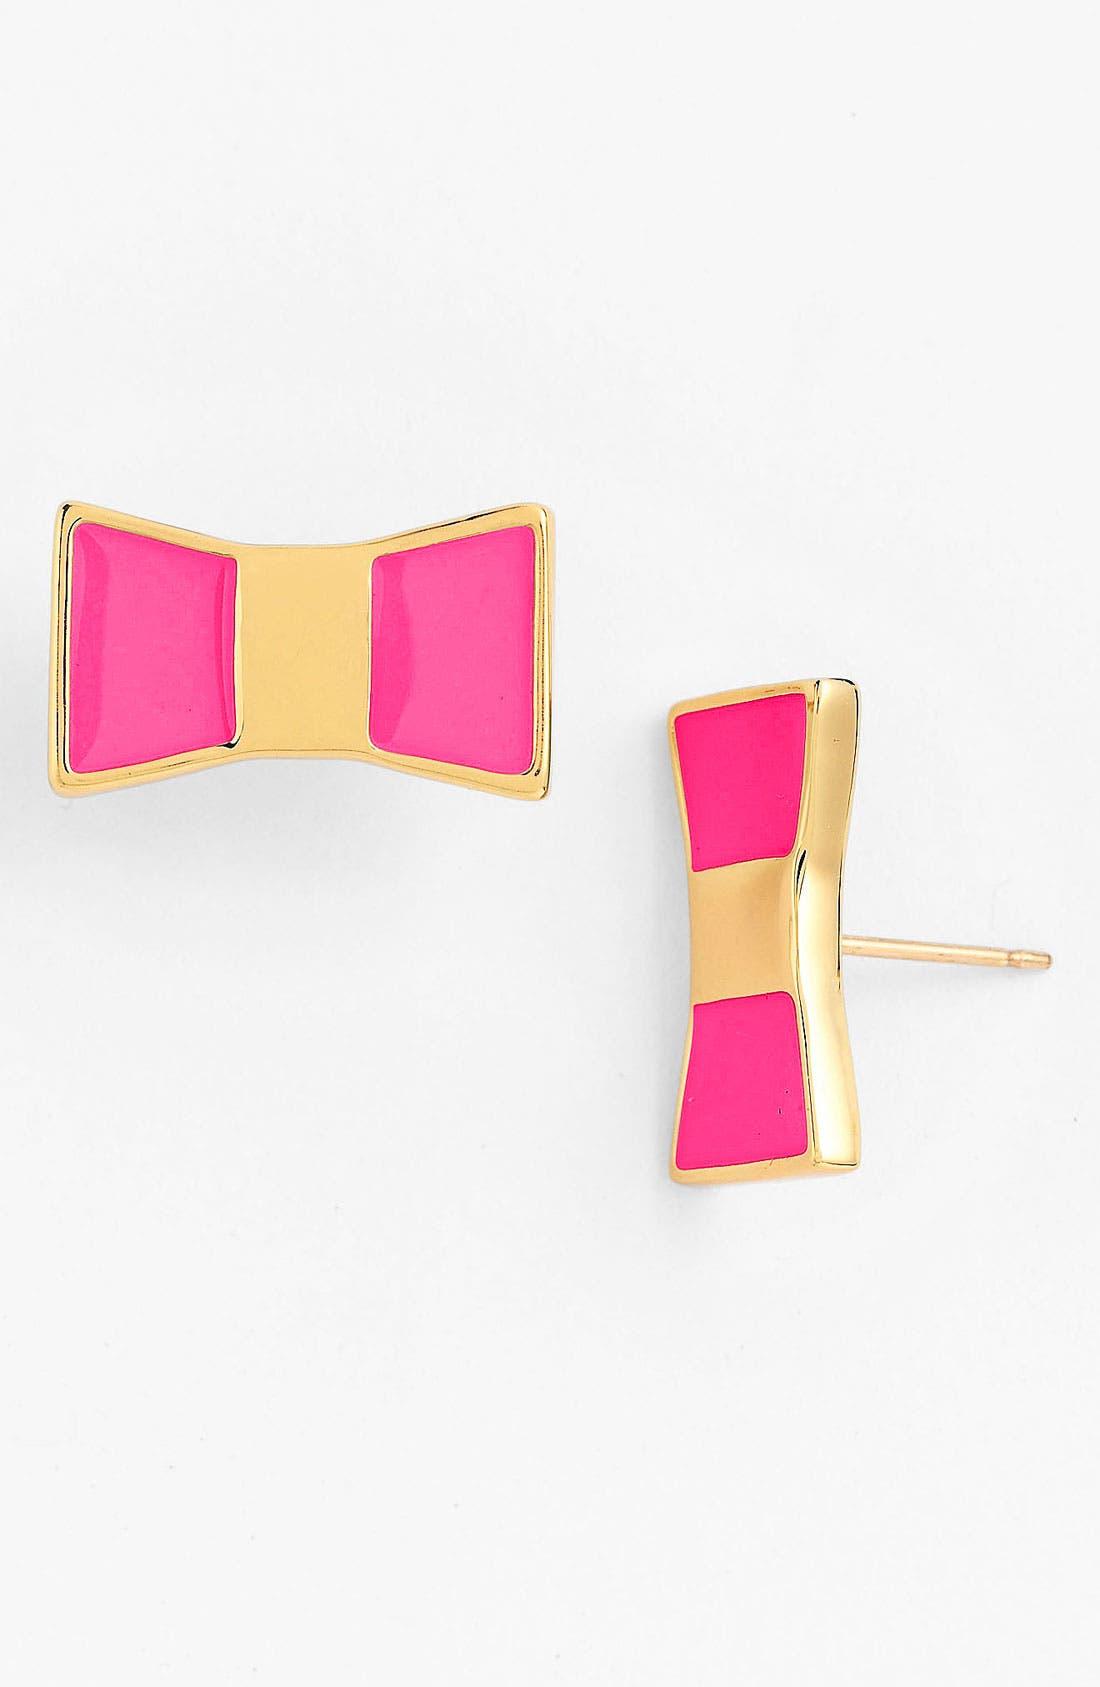 Main Image - kate spade new york 'bow shoppe' stud earrings